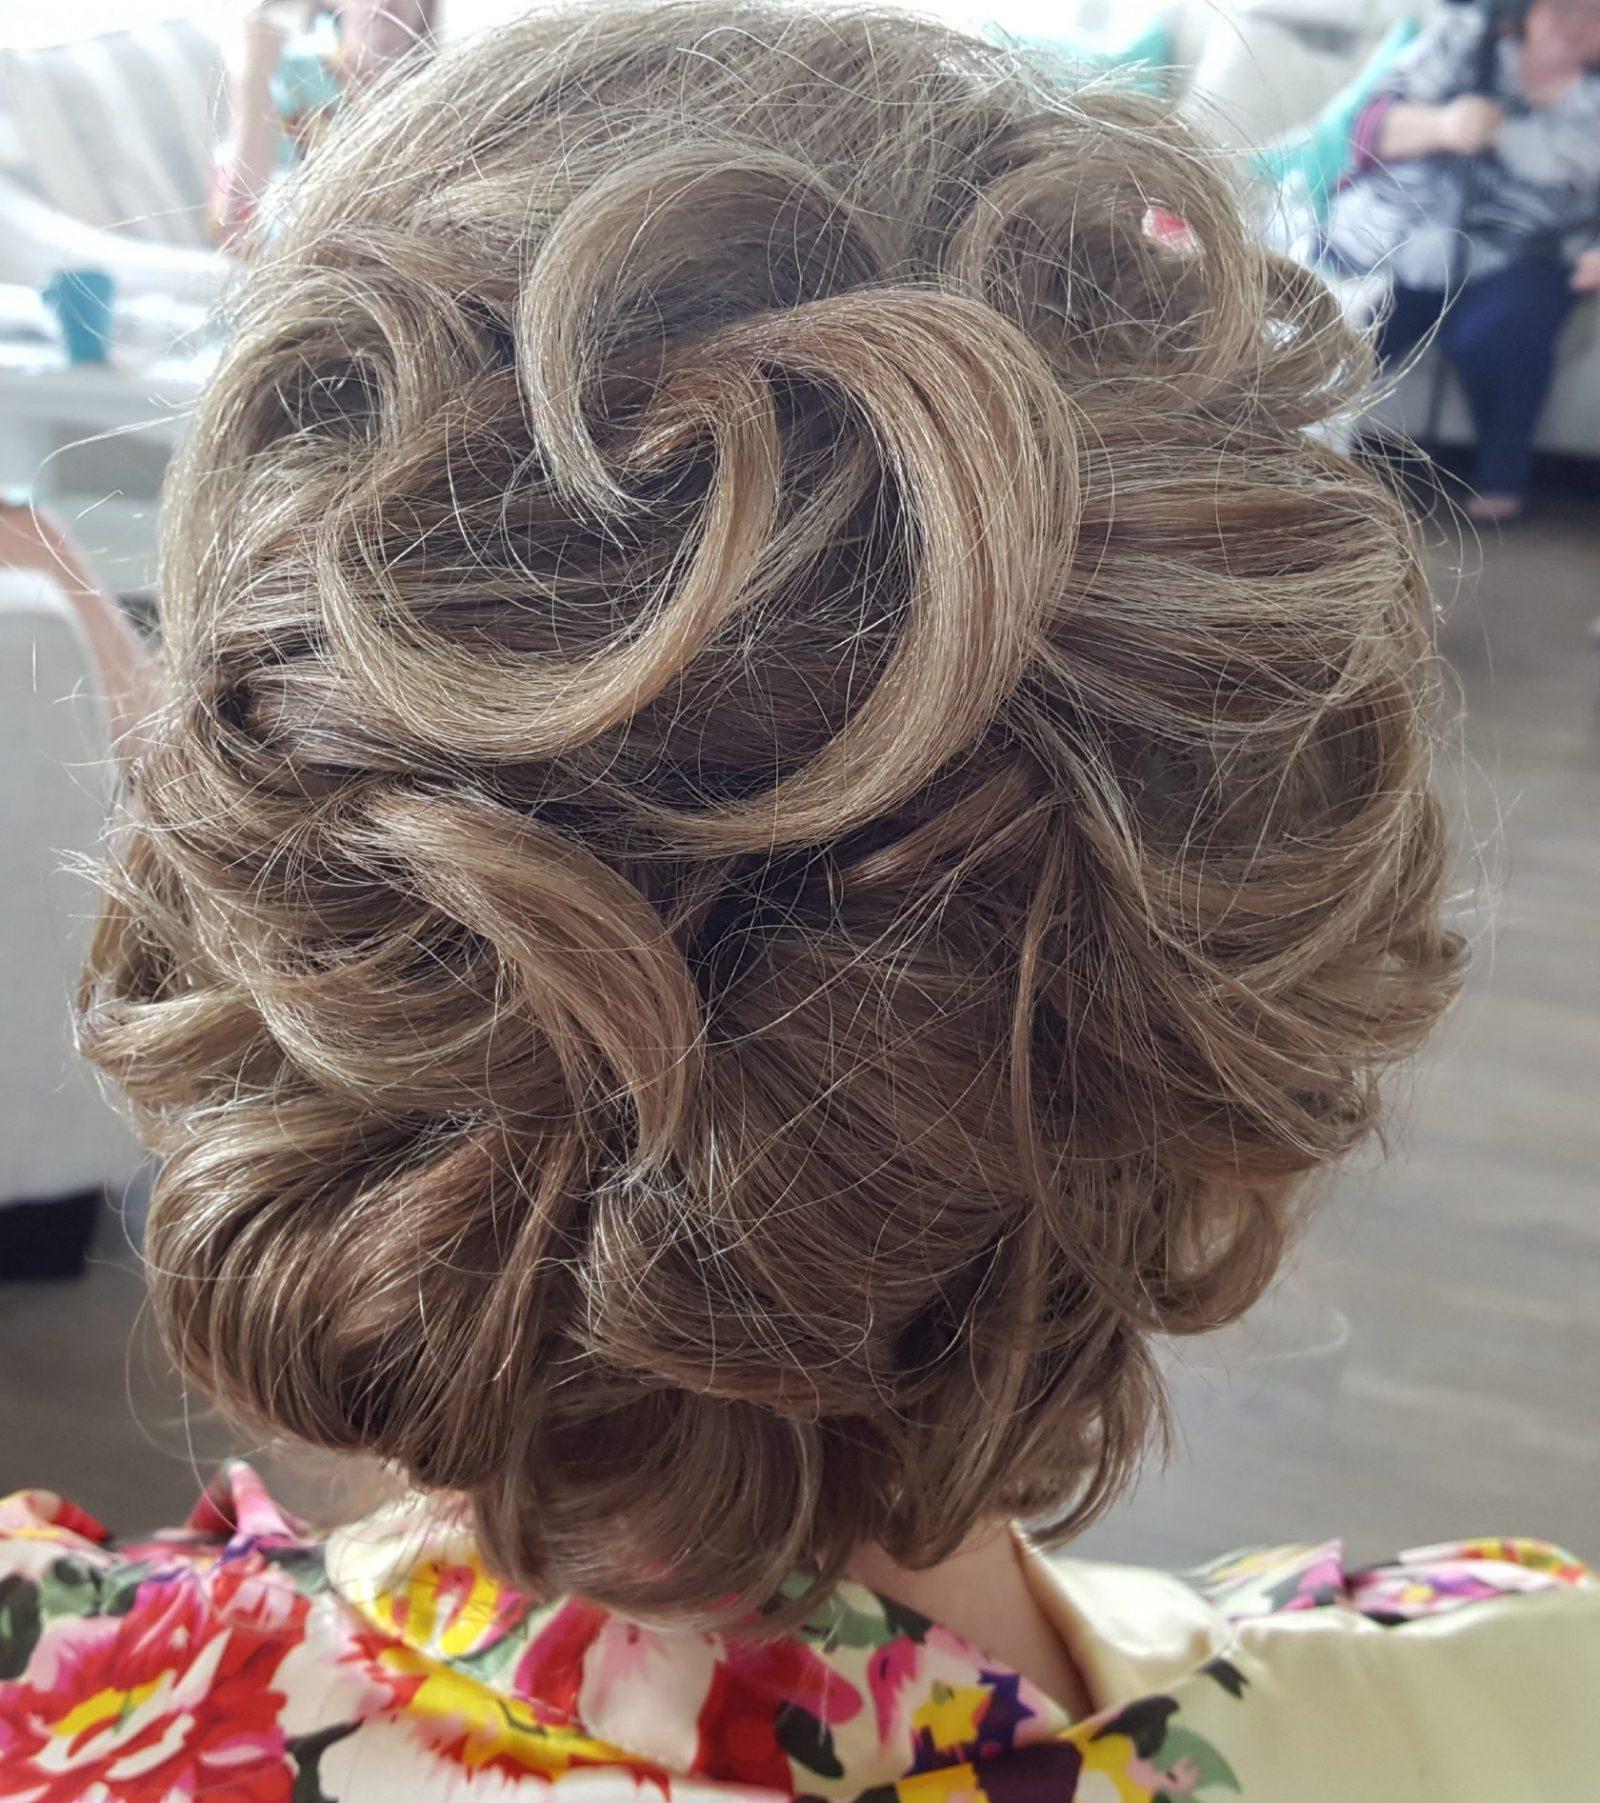 Shear Sailing Hair Salon Bridal Party Pre-Wedding Hair Services Bridal Up Do